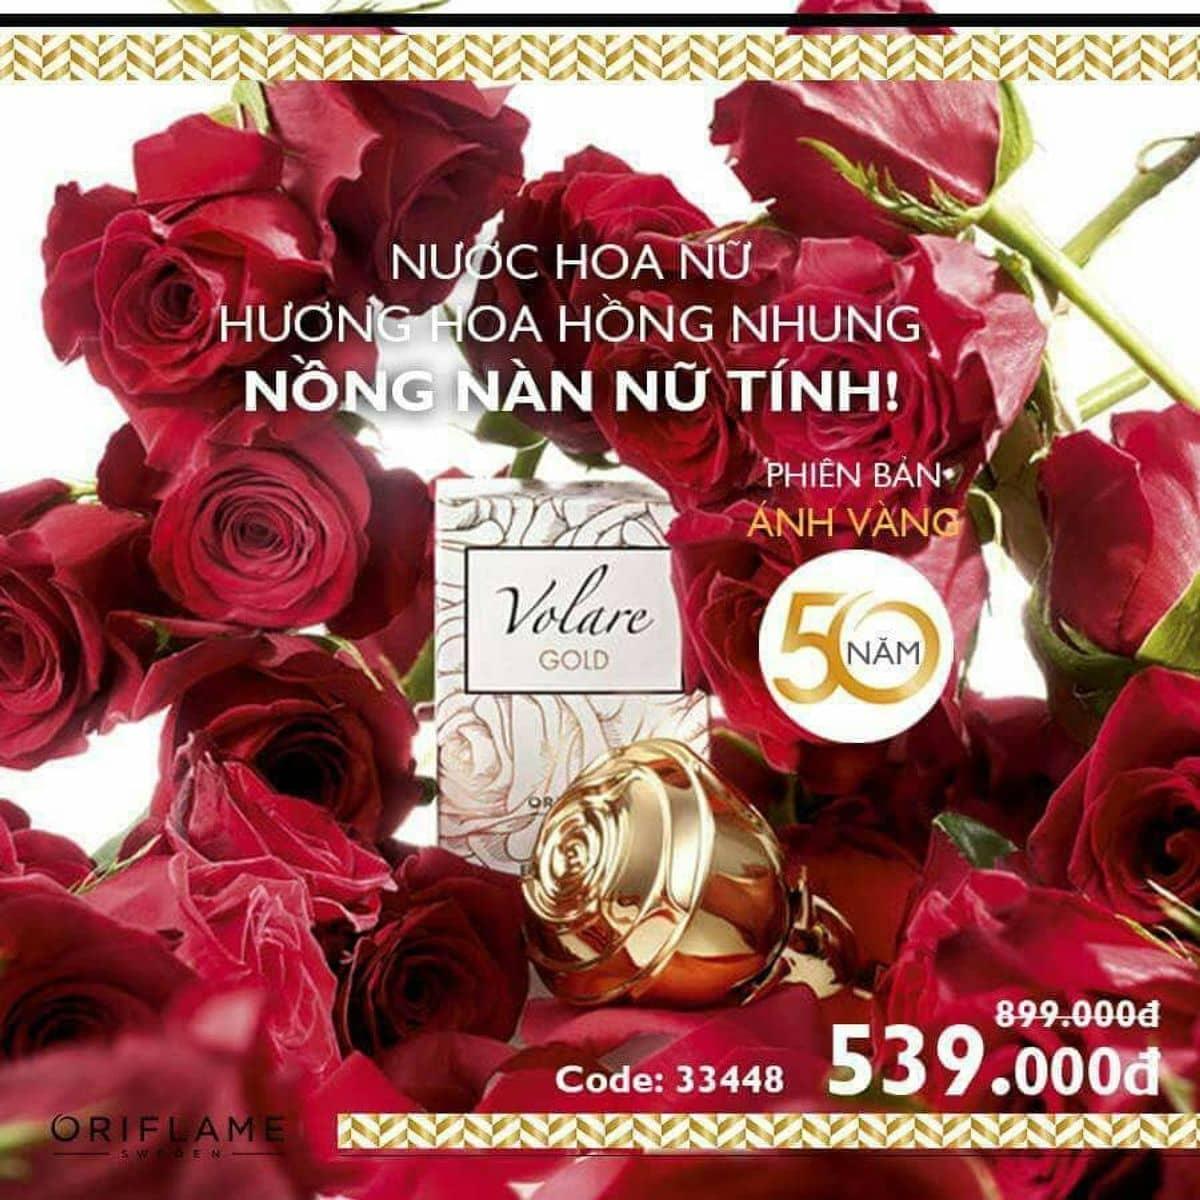 Nc Hoa Volare Gold Eau De Parfum Ti O S Tch Phc Kin Nh 50ml By Oryflame B Ca Hery Linh Lozi